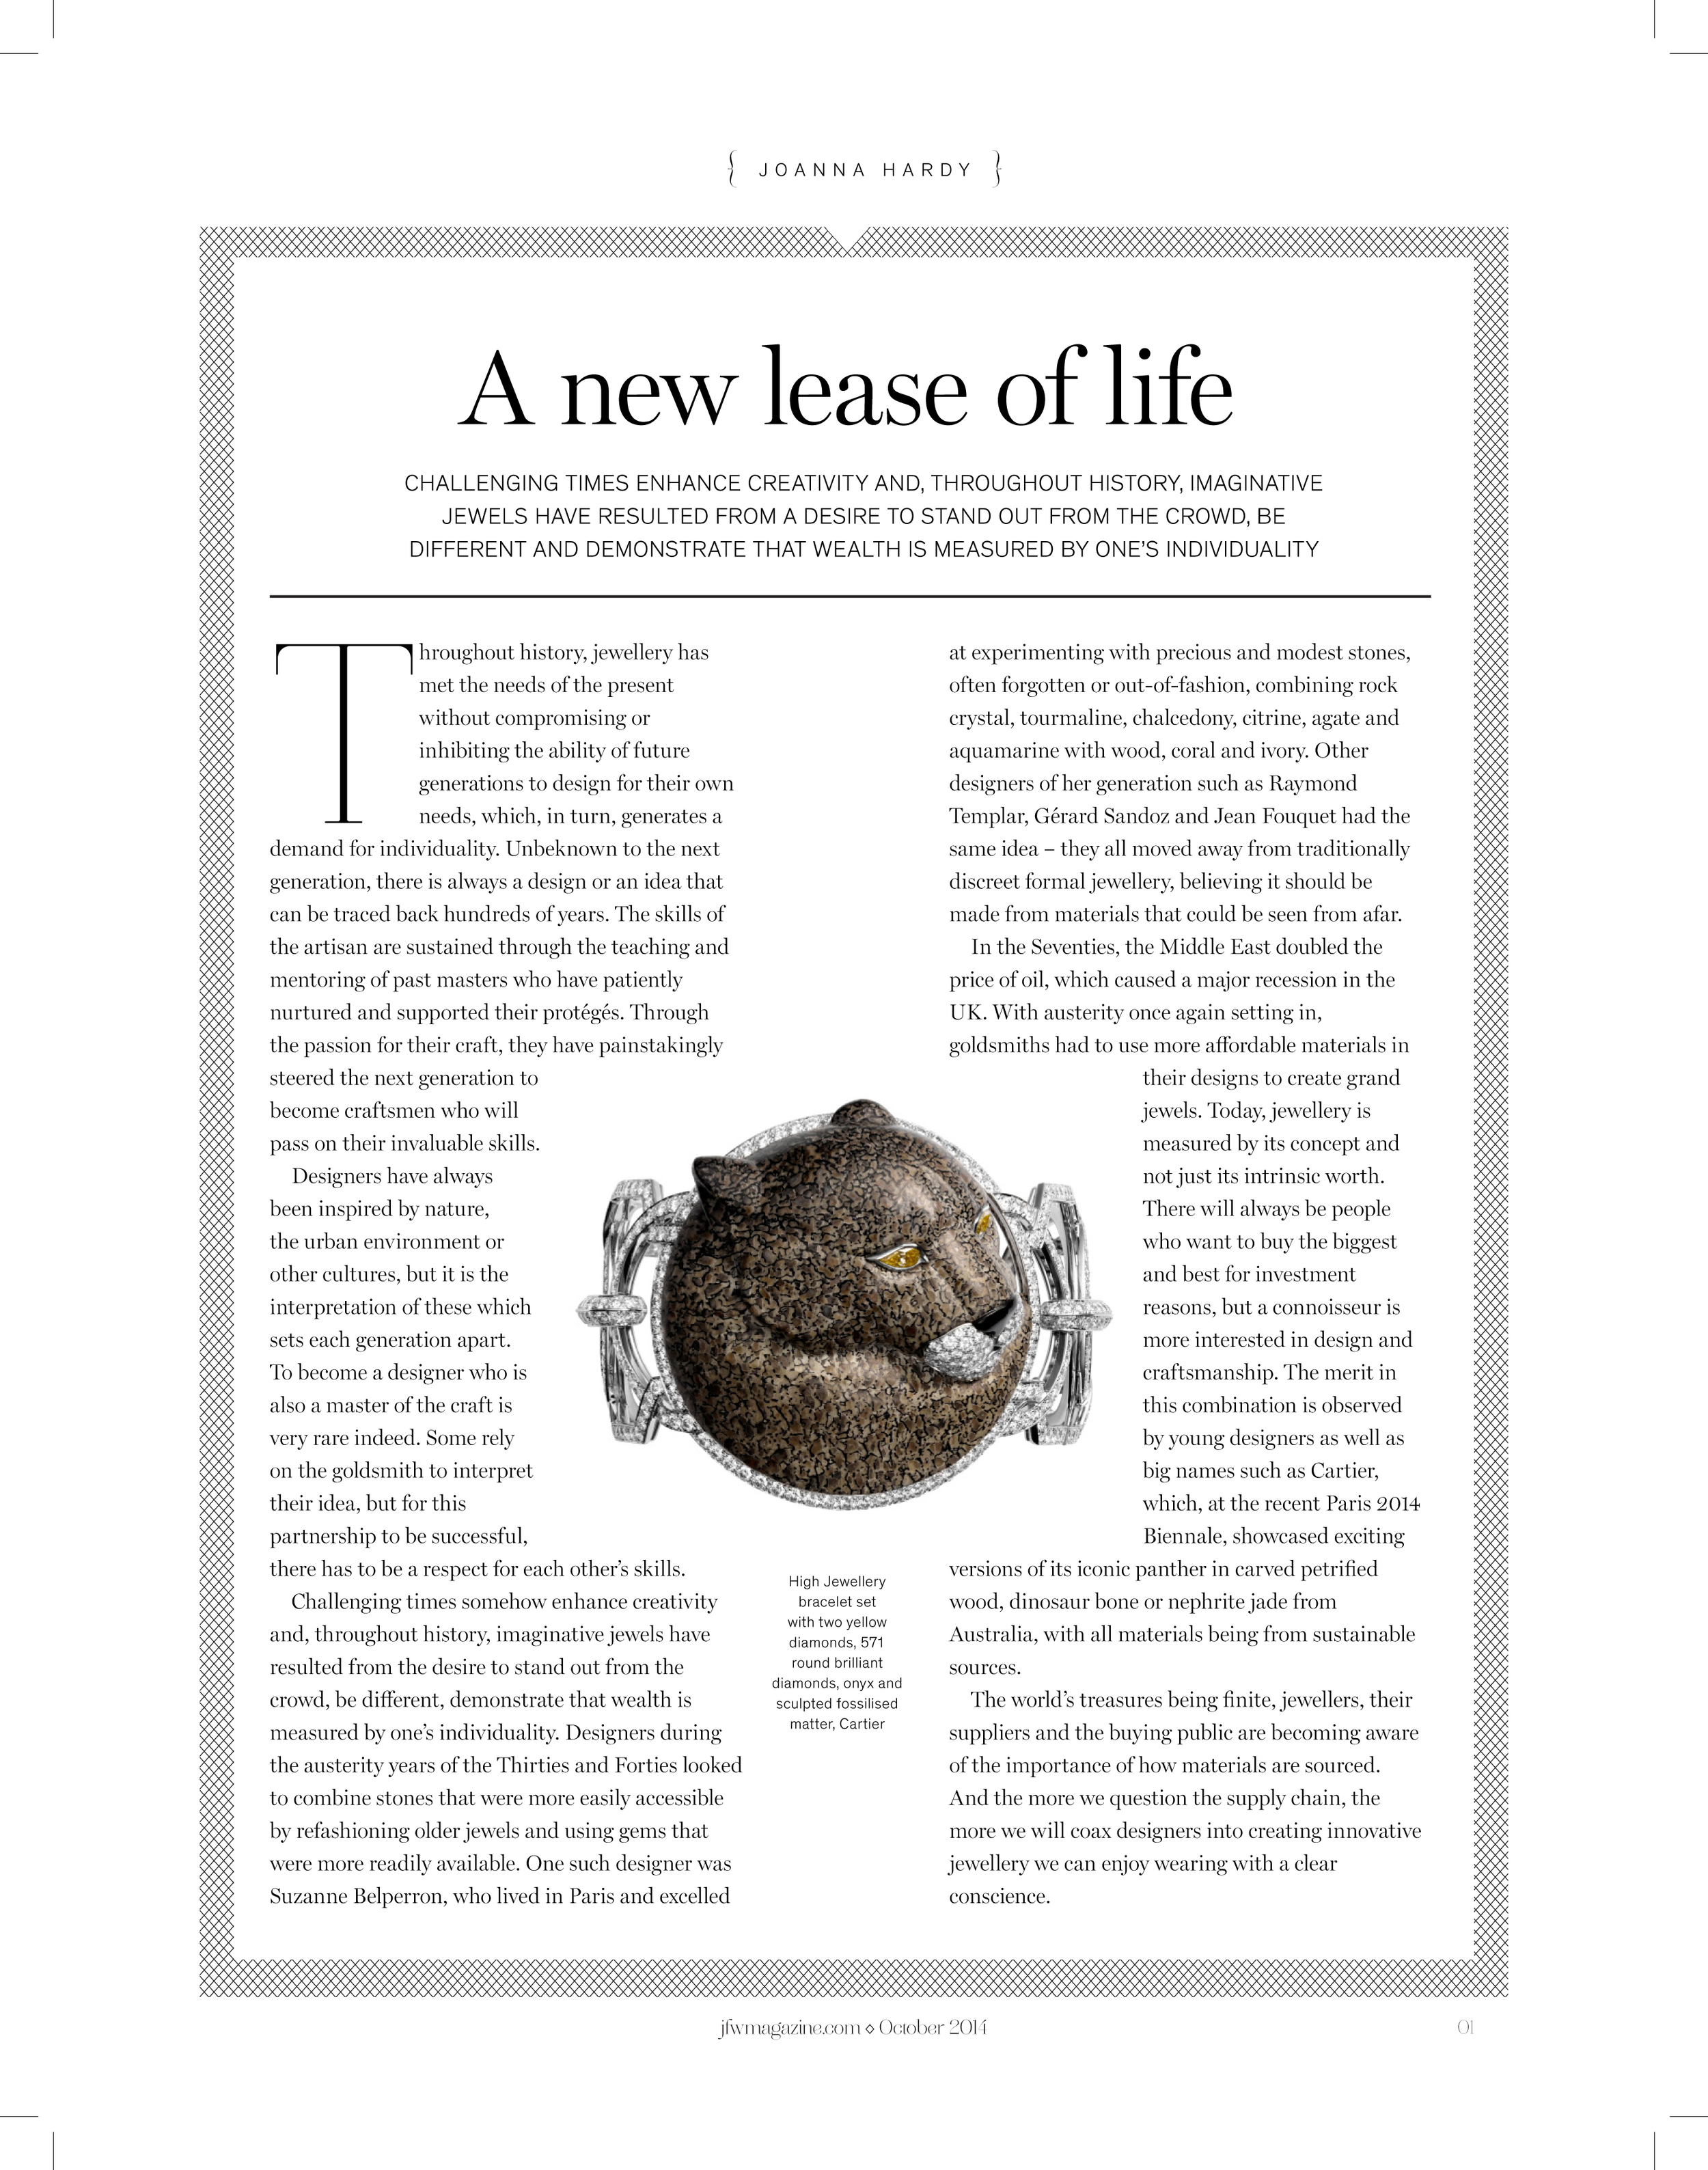 JFW Magazine.com October 2014